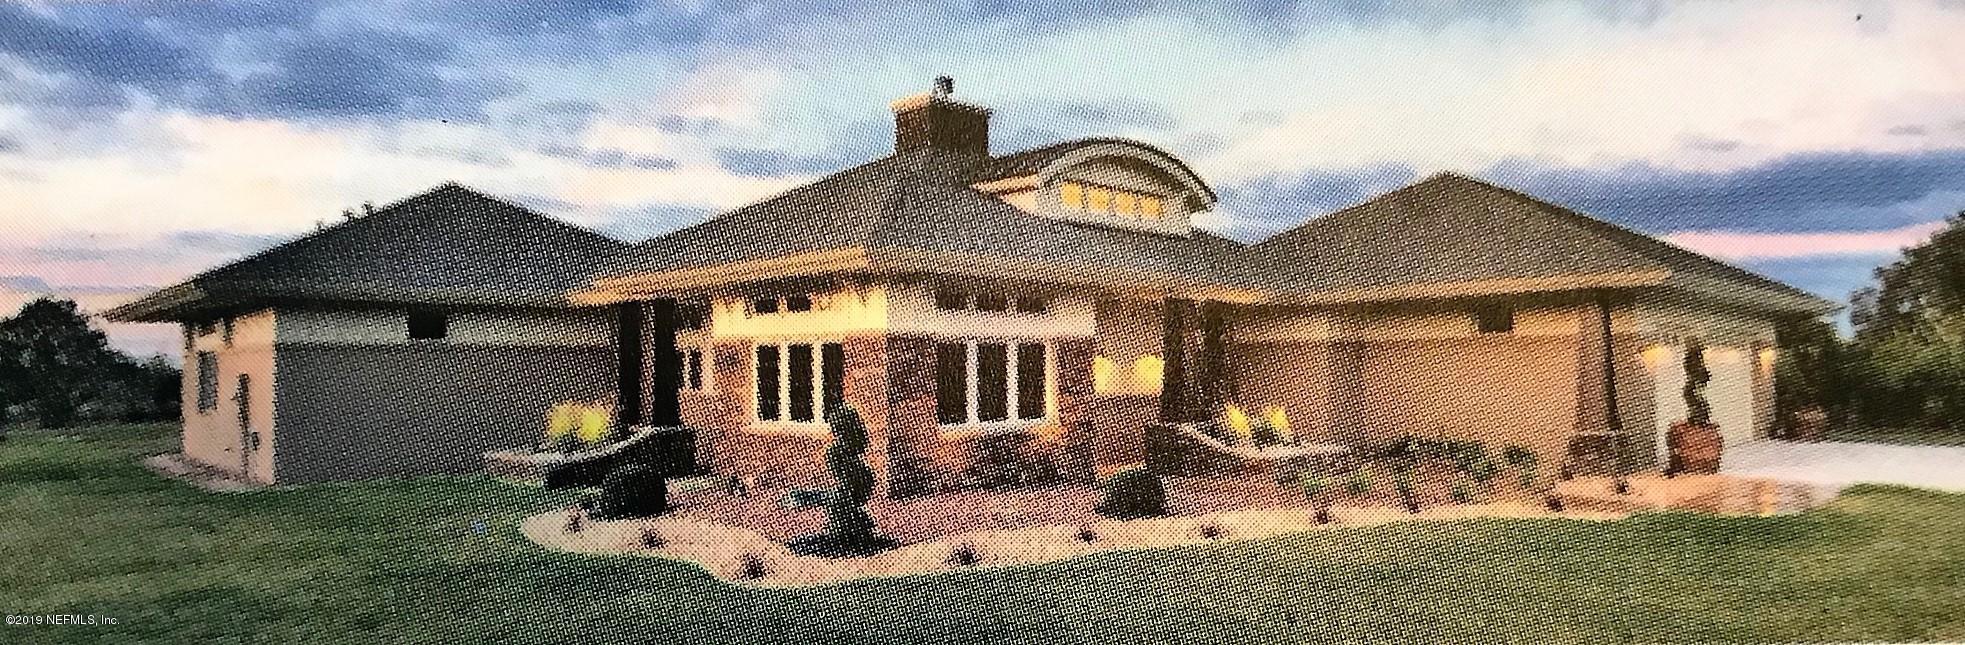 5501 ROBIN, KEYSTONE HEIGHTS, FLORIDA 32656, 4 Bedrooms Bedrooms, ,3 BathroomsBathrooms,Residential,For sale,ROBIN,972709